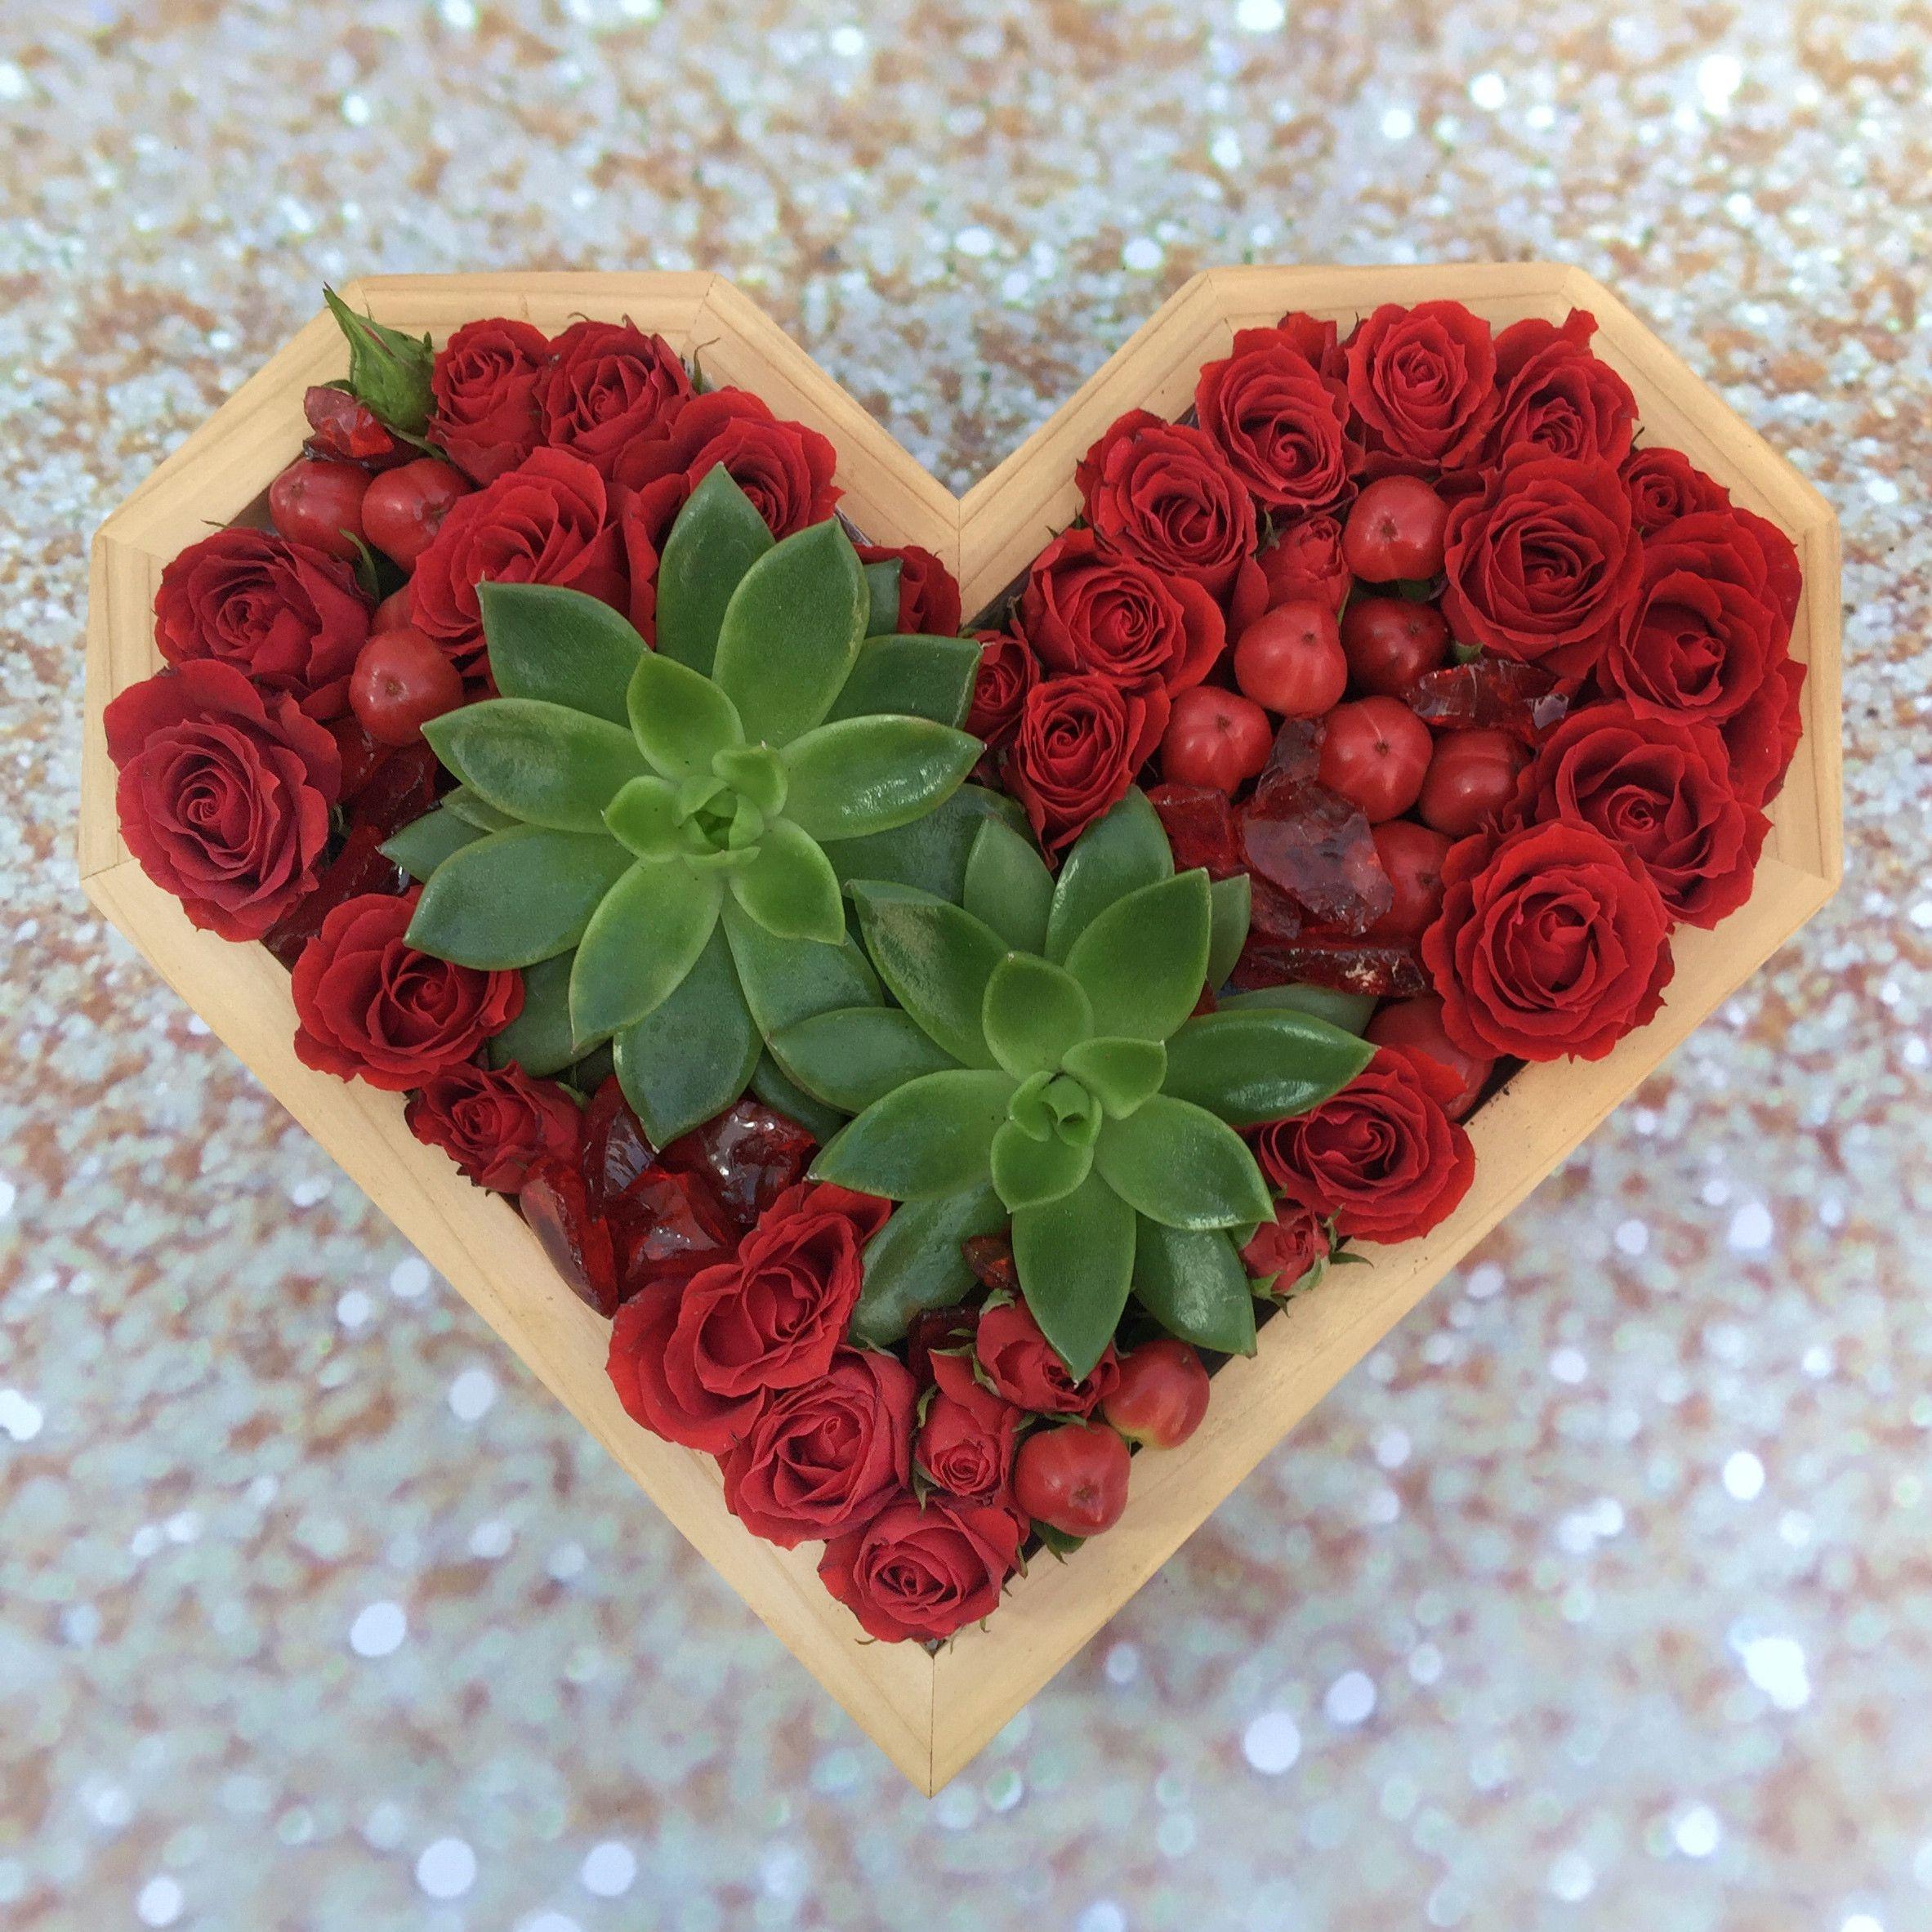 Valentine's Day 2019 | Flower delivery, Same day flower ...